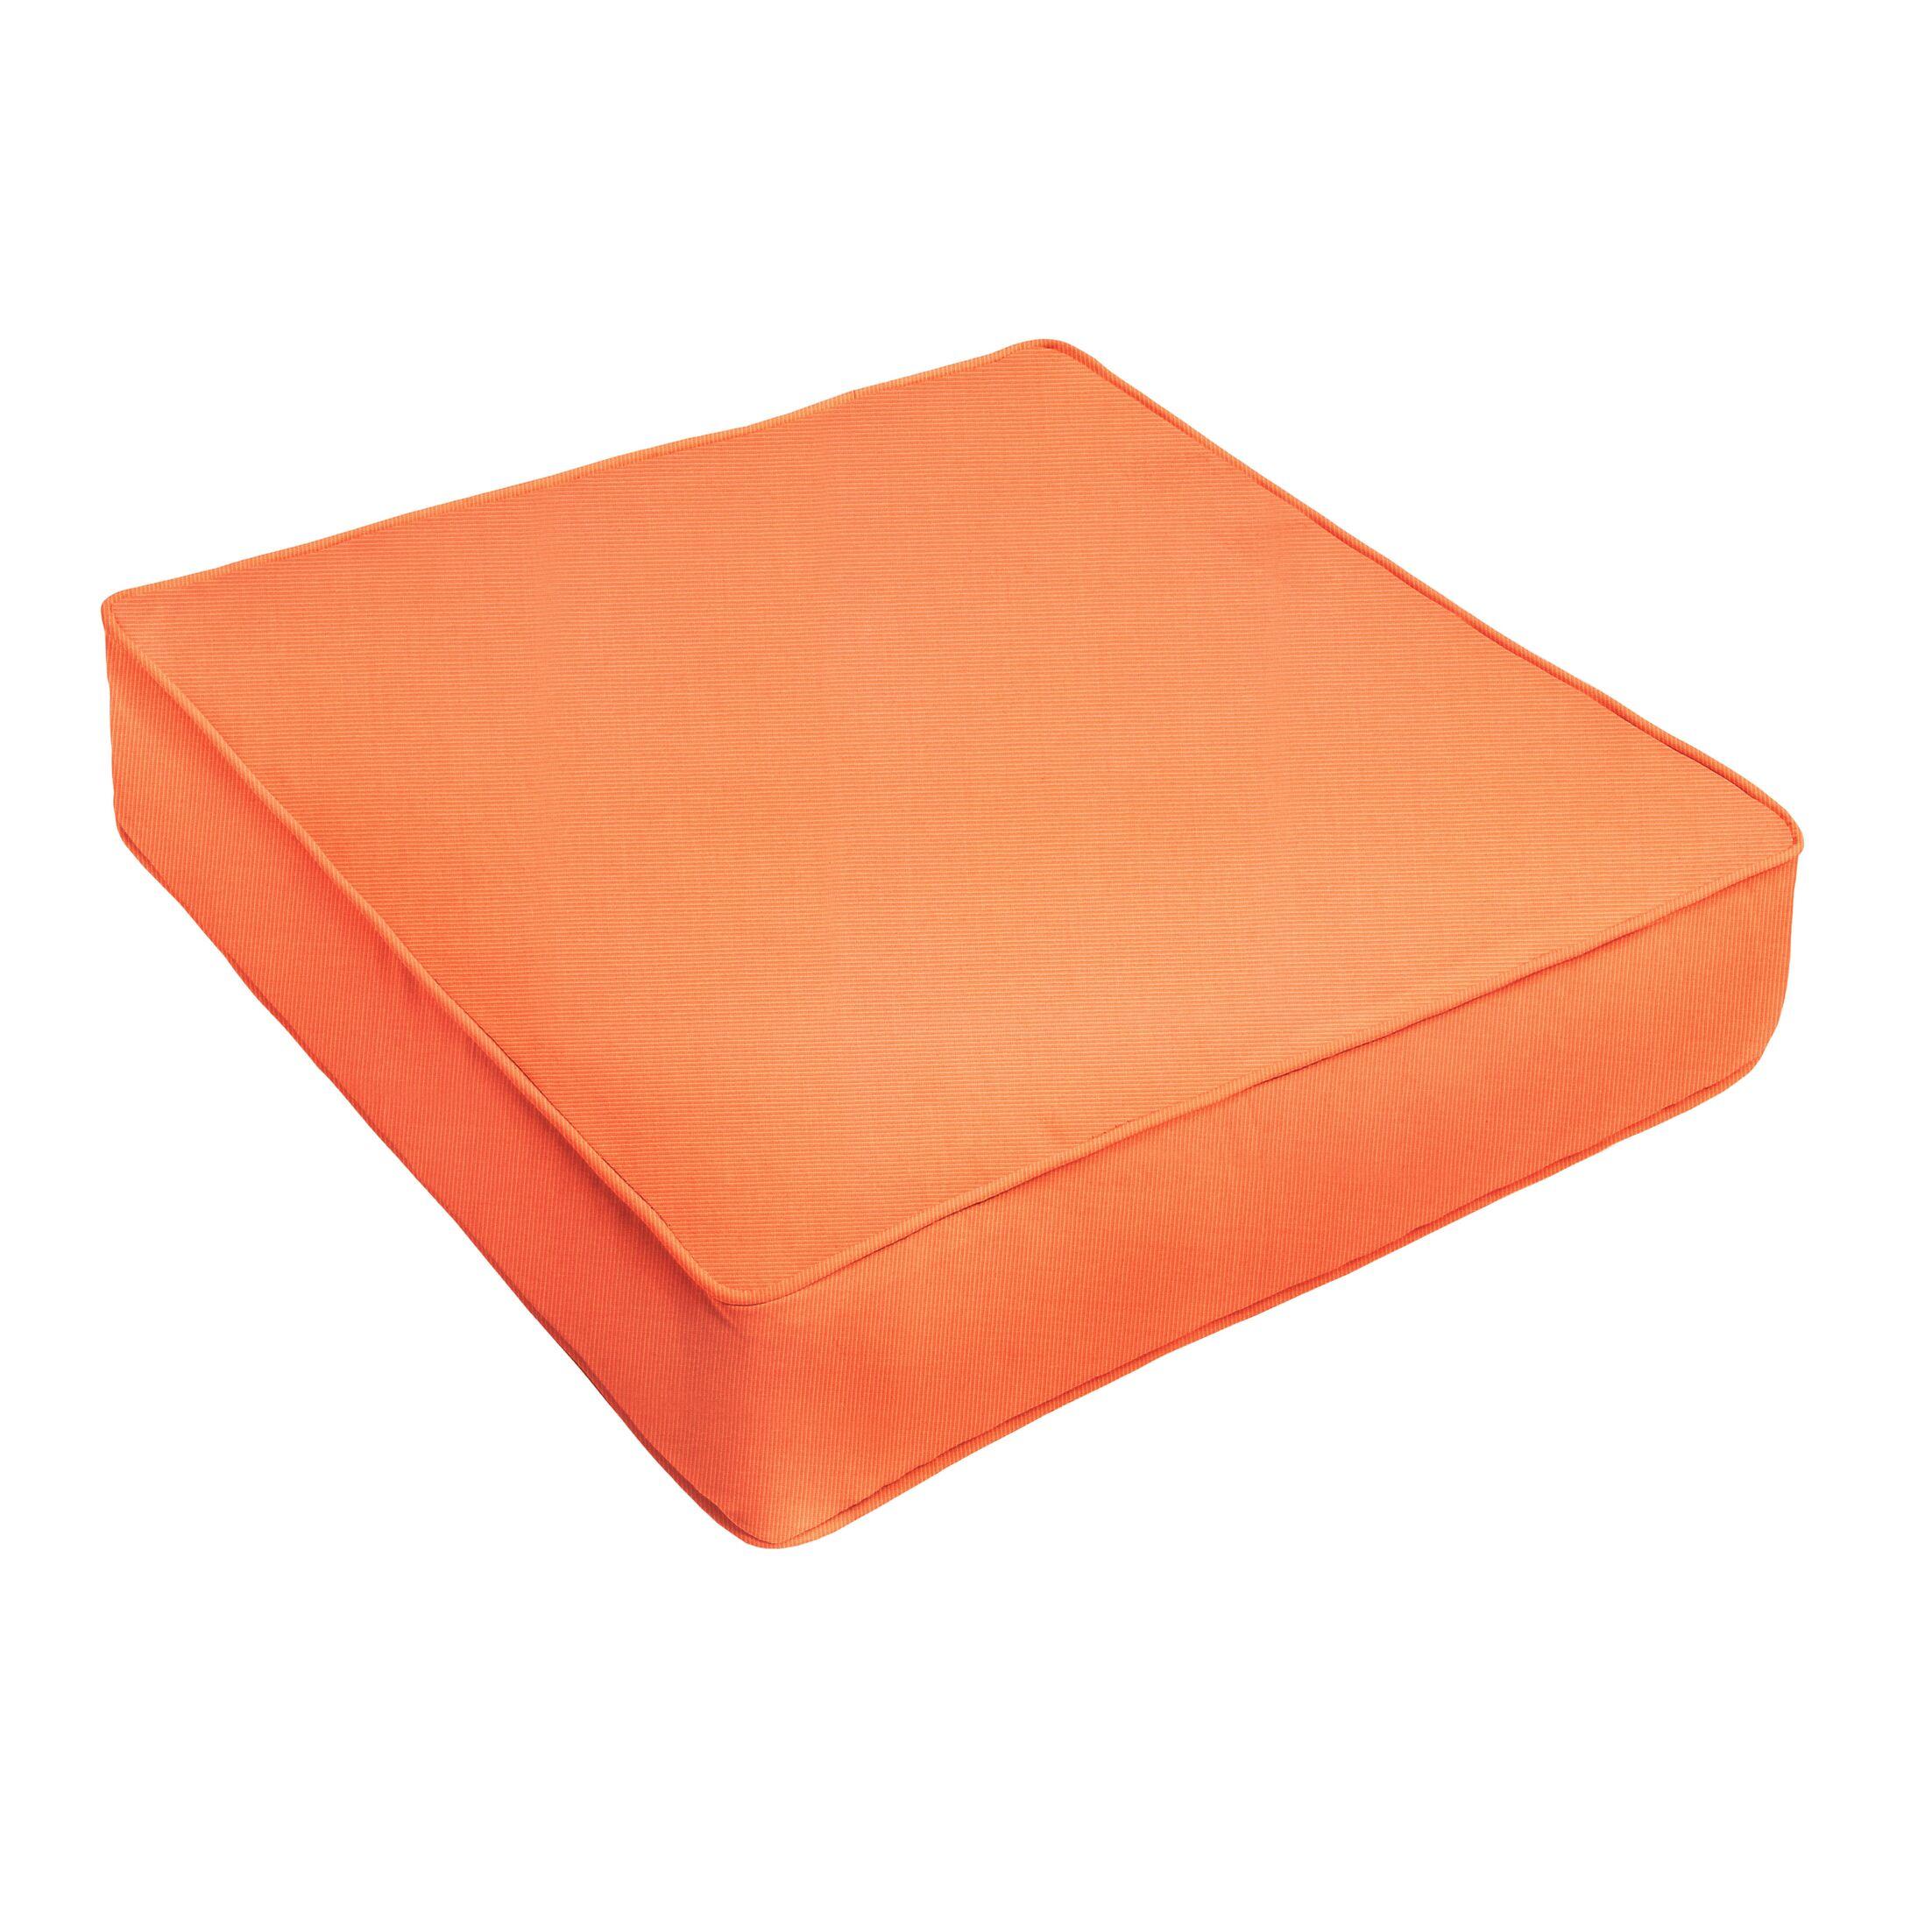 Outdoor Sunbrella Ottoman Cushion Color: Sunbrella Canvas Tangerine